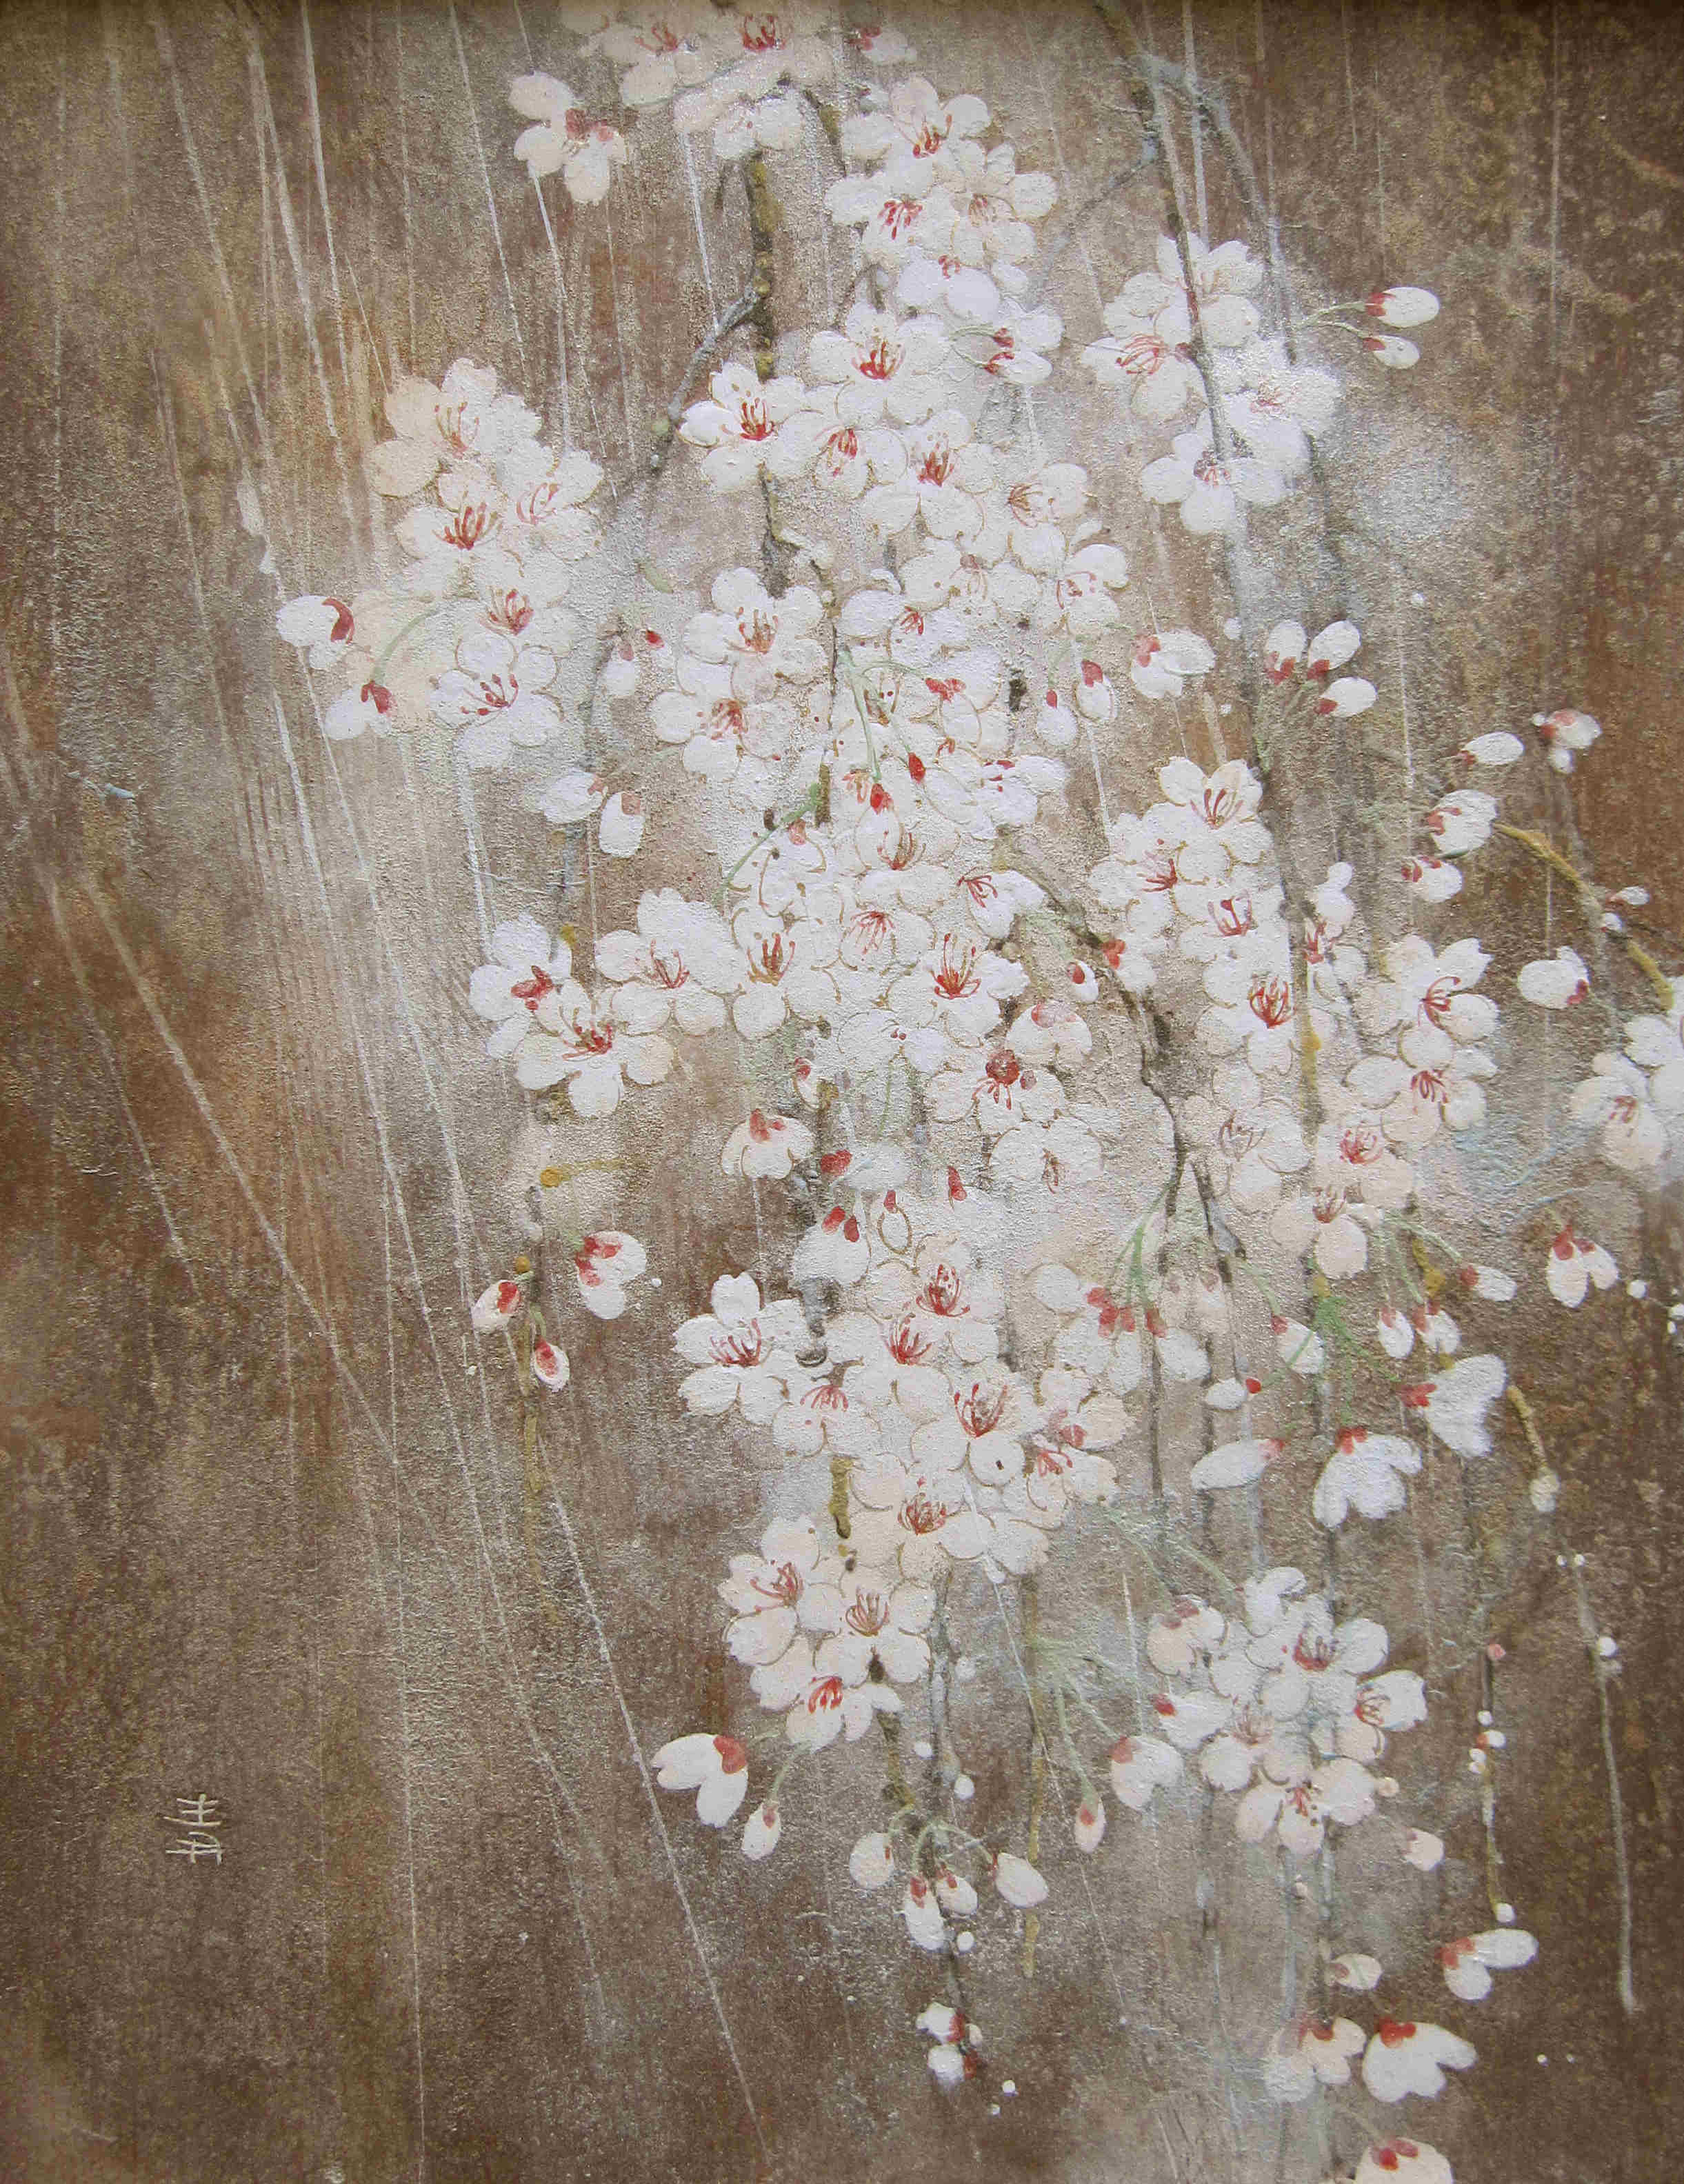 Cerisier - 35,4x27,4 cm / 2011